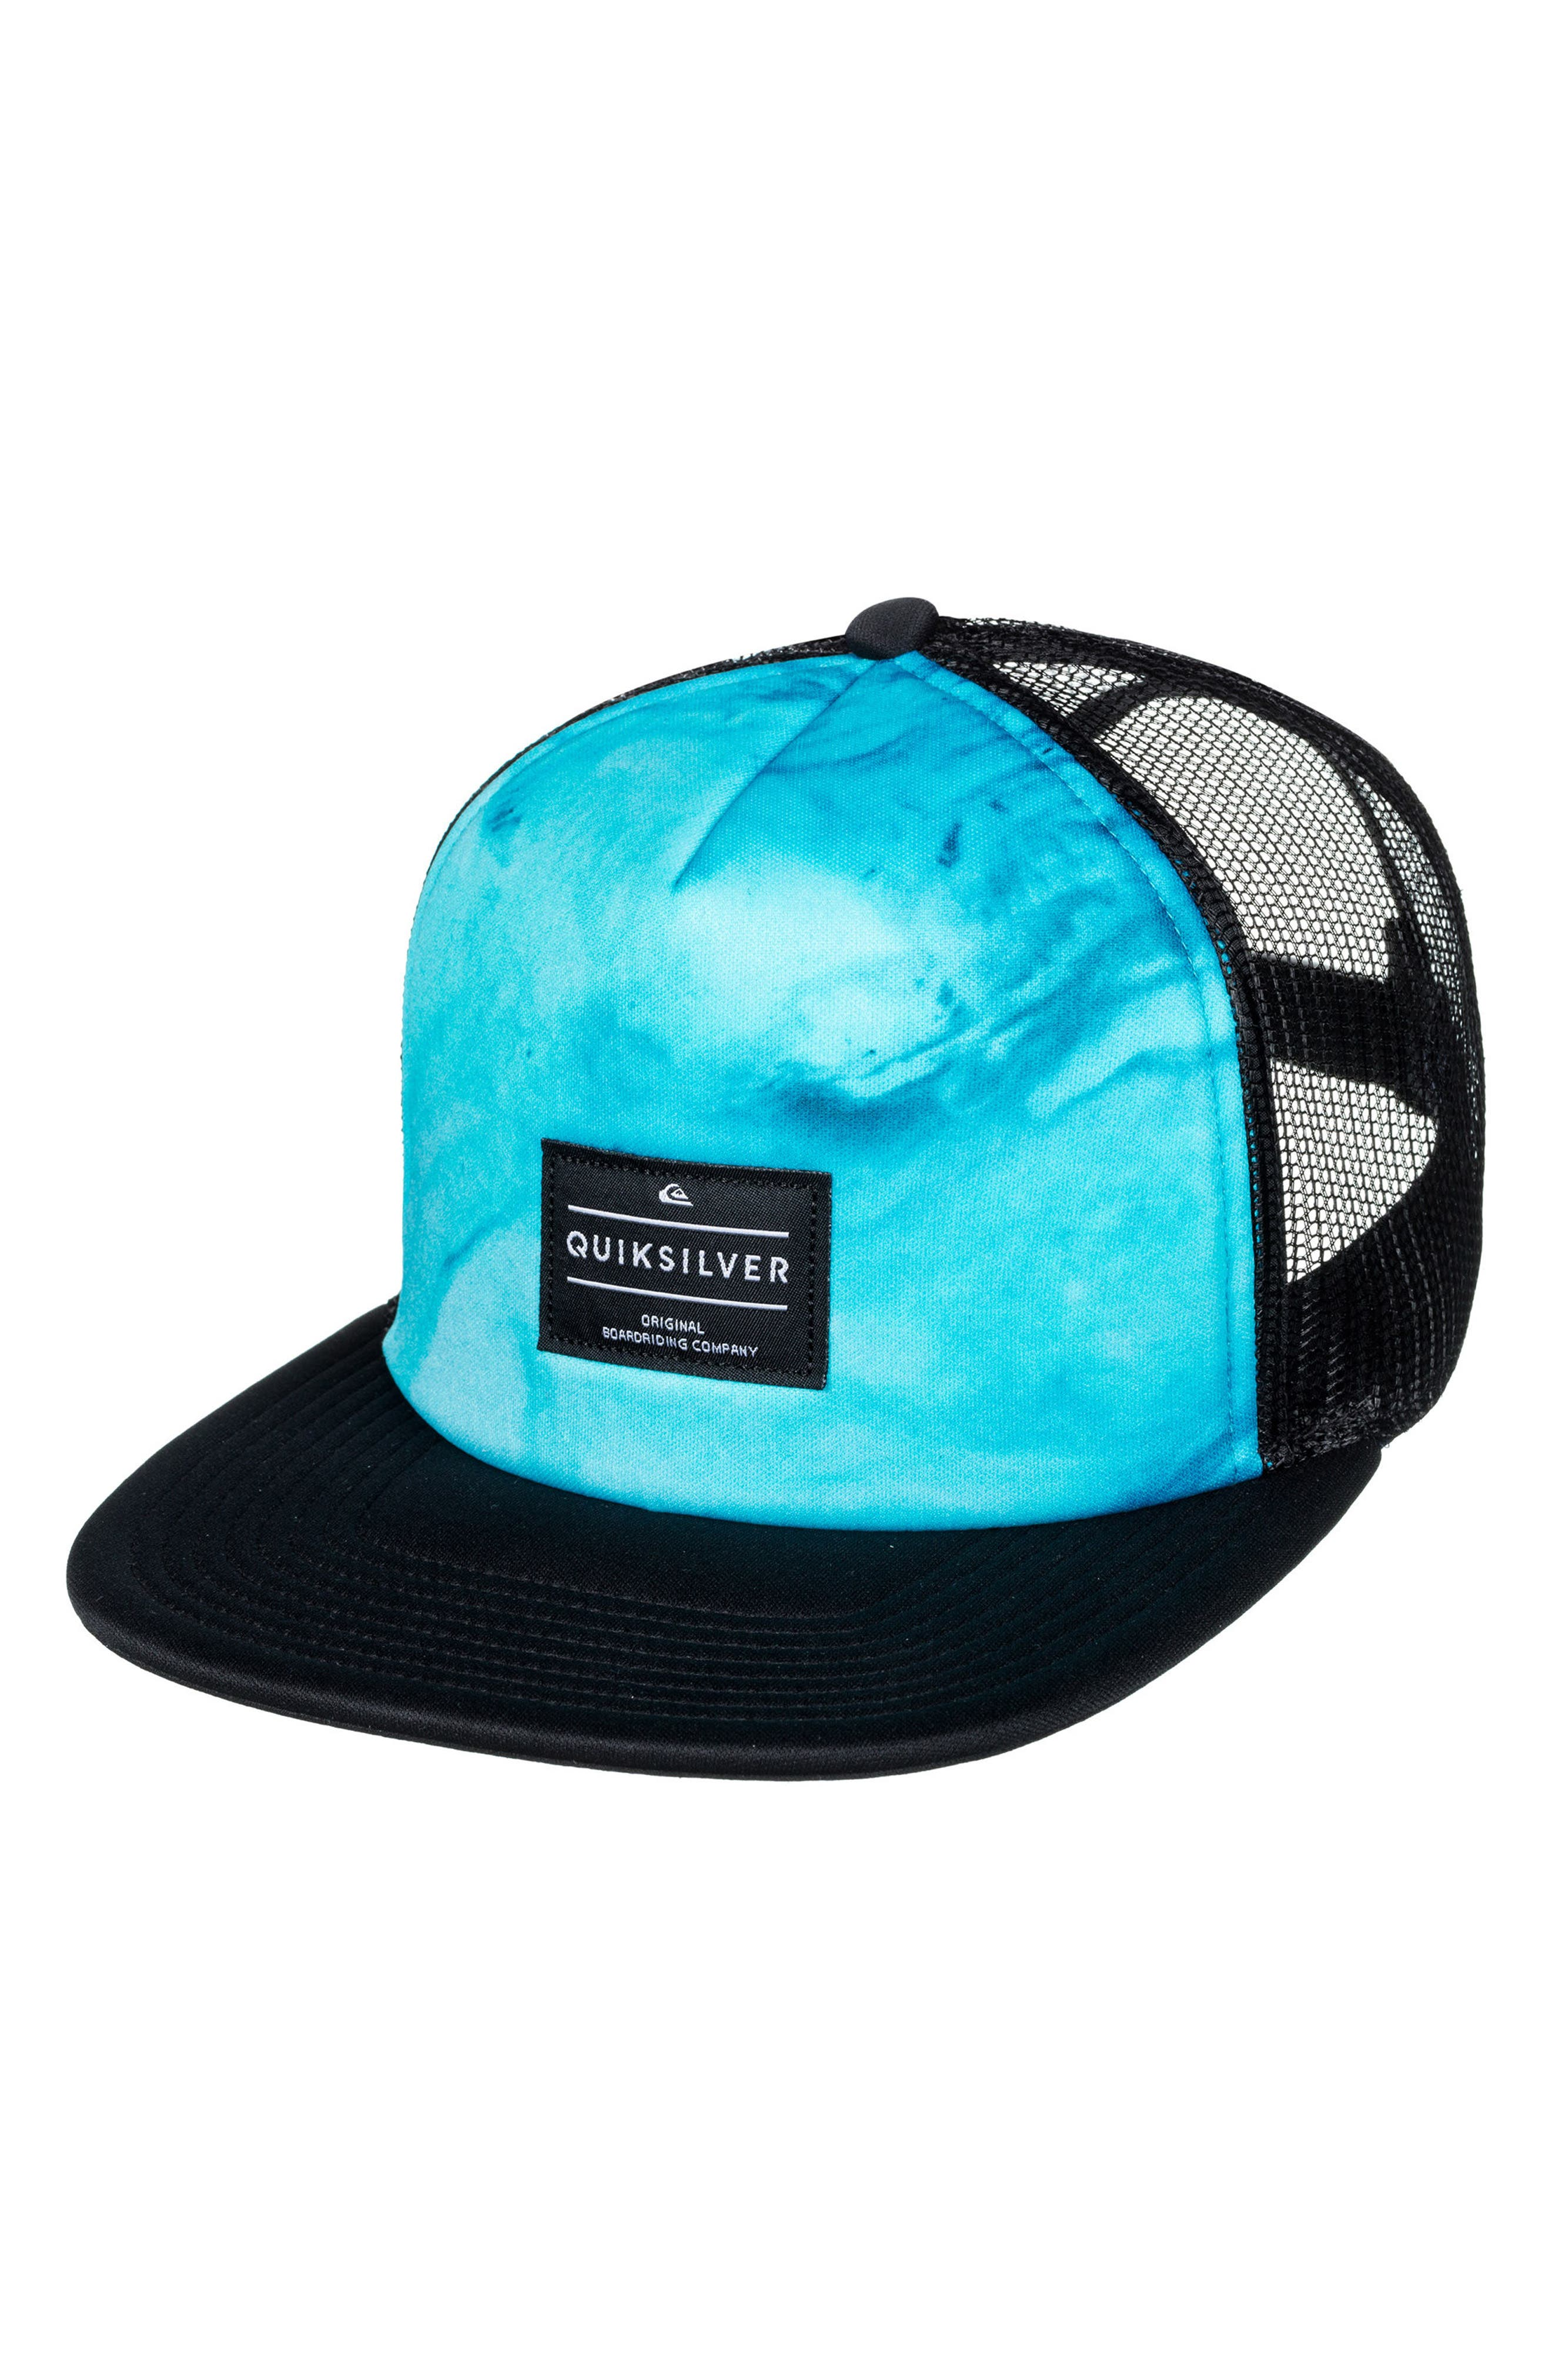 Brissells Snapback Trucker Hat,                             Main thumbnail 1, color,                             002